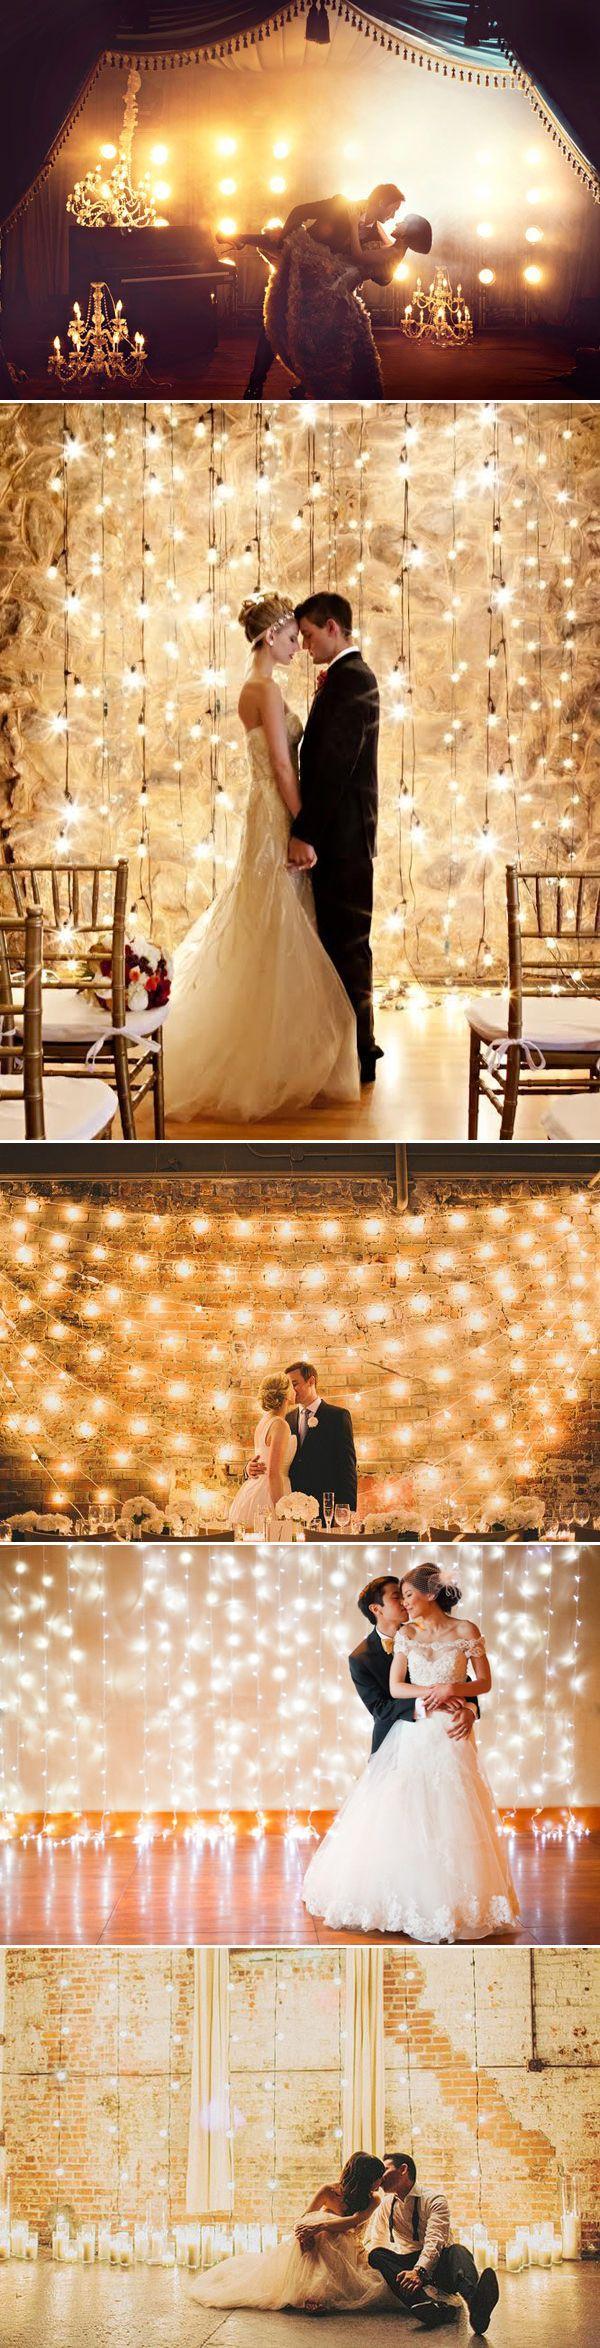 Свадьба - 53 Super Creative Wedding Photo Backdrops